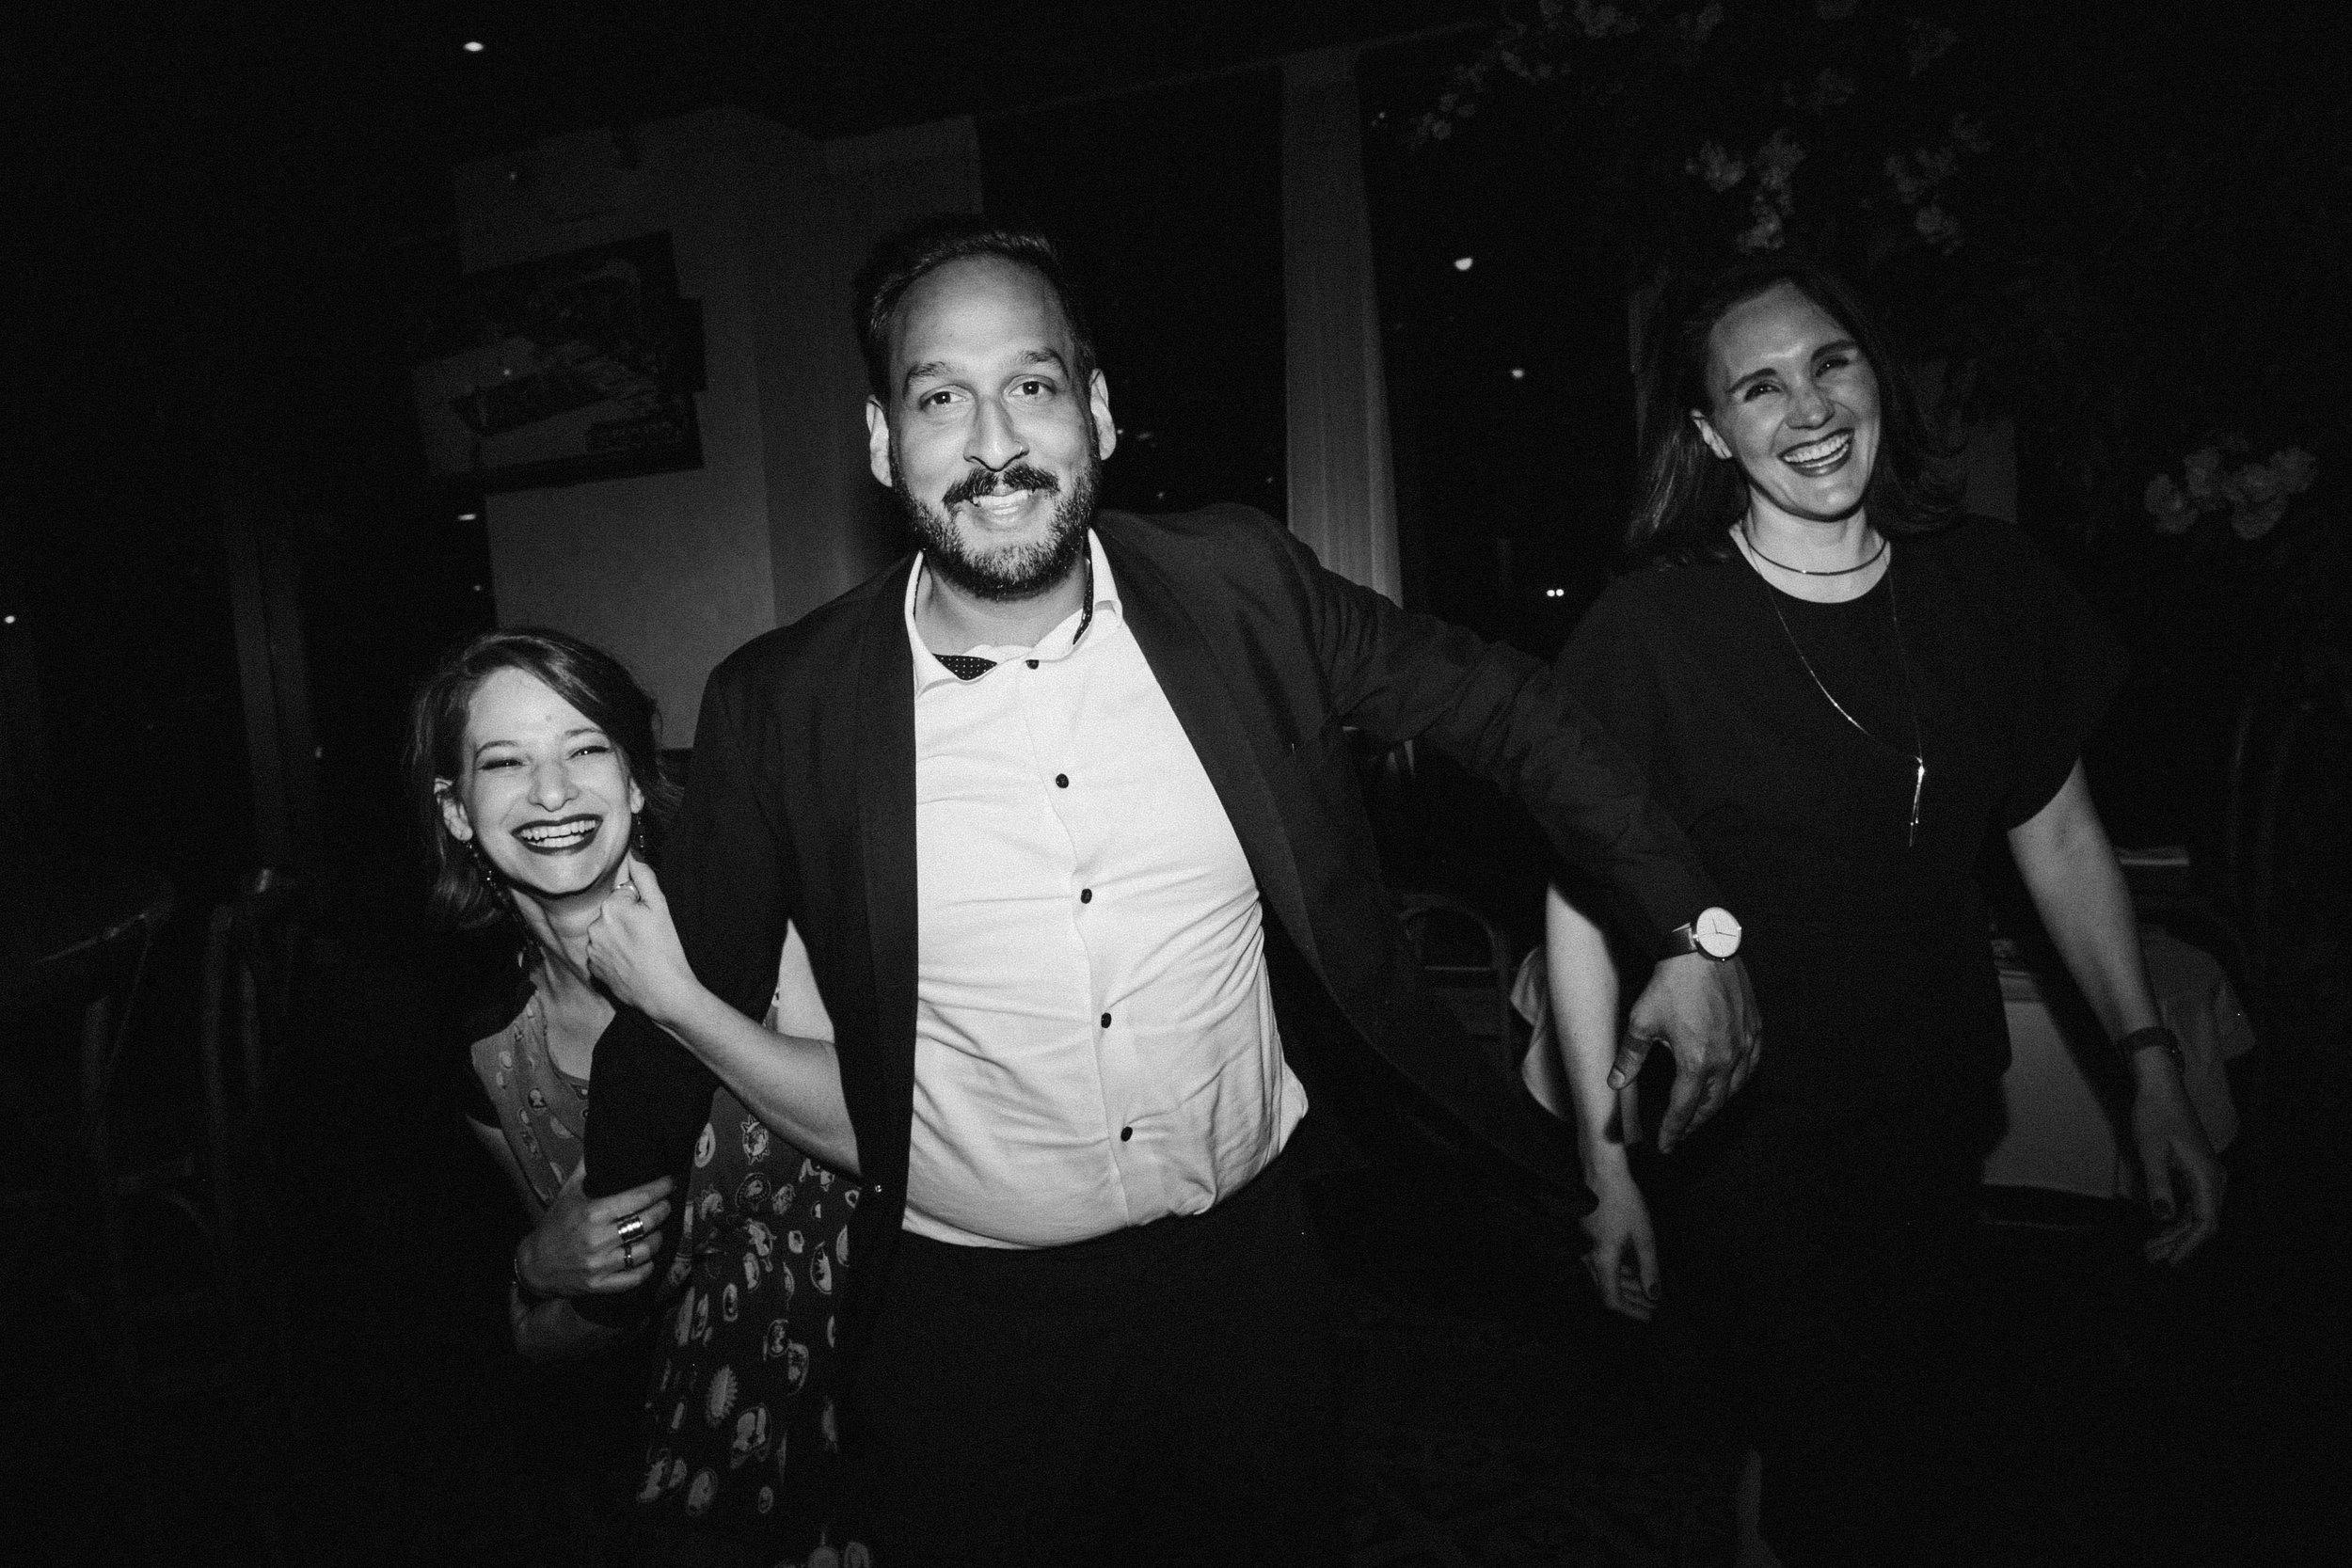 Sevlynn-Photography-Wedding-LIC-Landing-Maiella-NYC-68.jpg